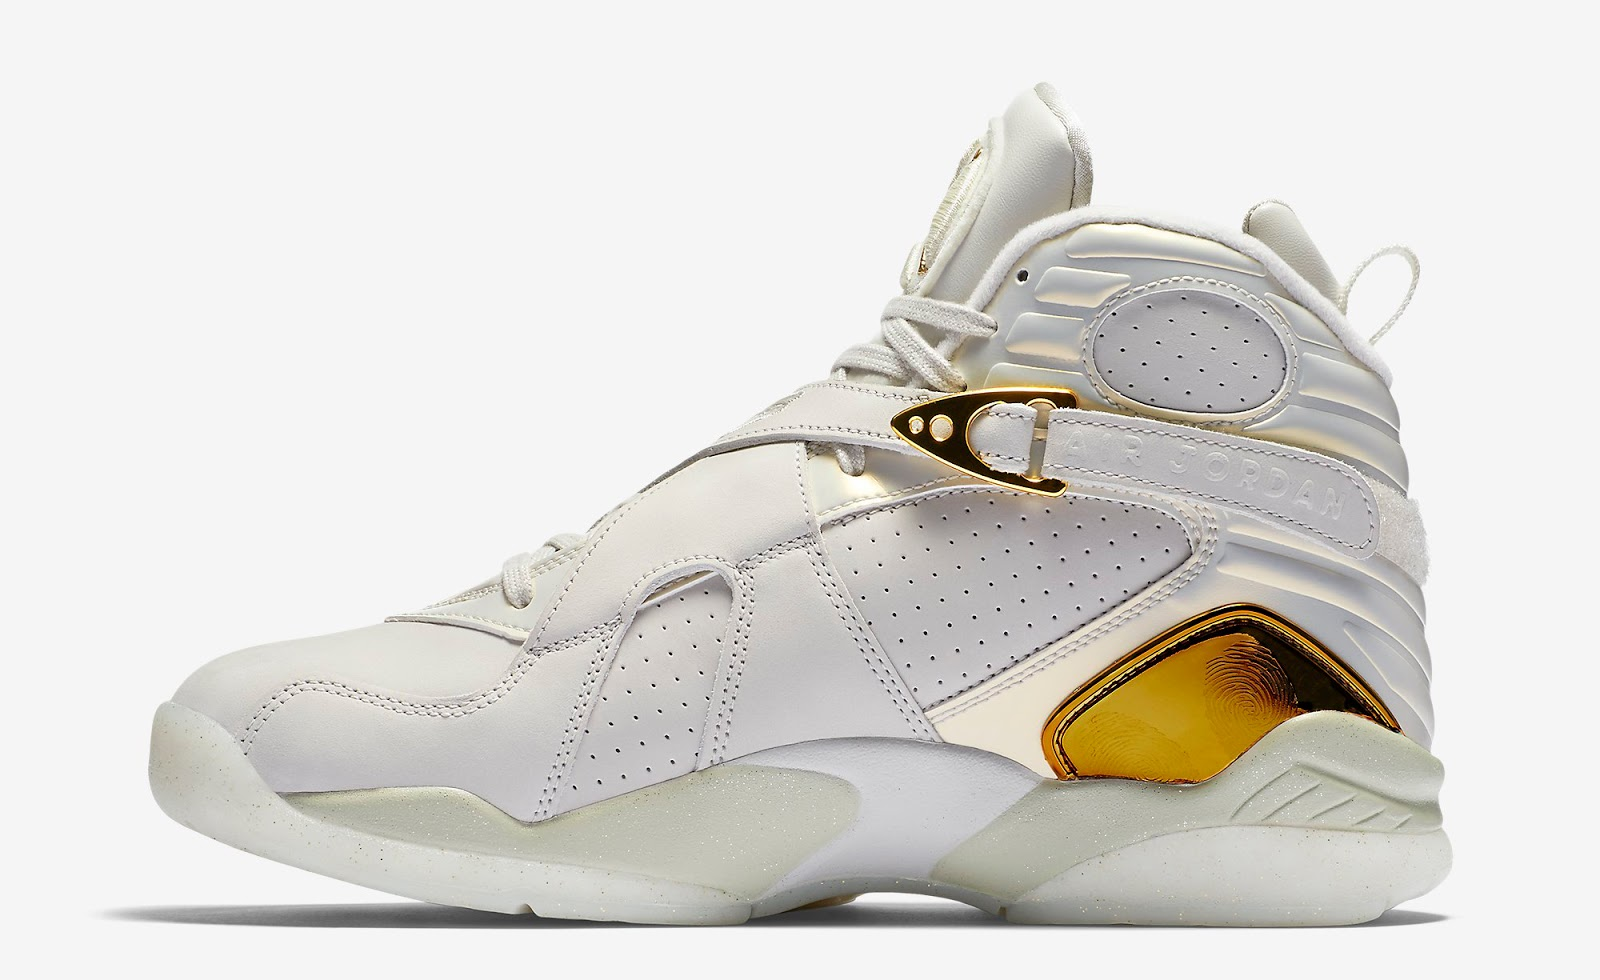 e80af277500 ajordanxi Your  1 Source For Sneaker Release Dates  Air Jordan 8 ...